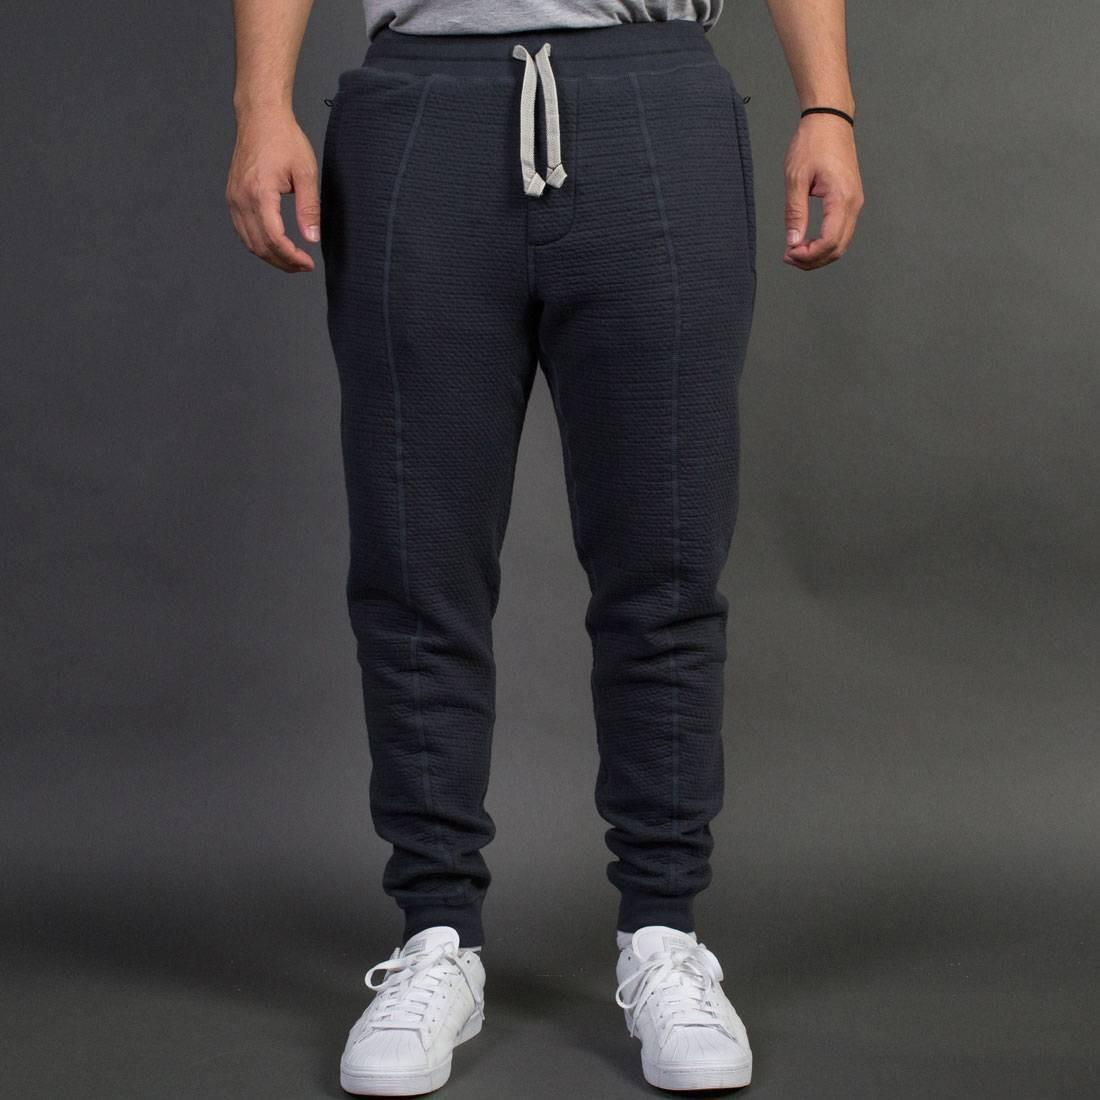 Adidas x Wings + Horns Men Cabin Fleece Pants (gray / night grey)